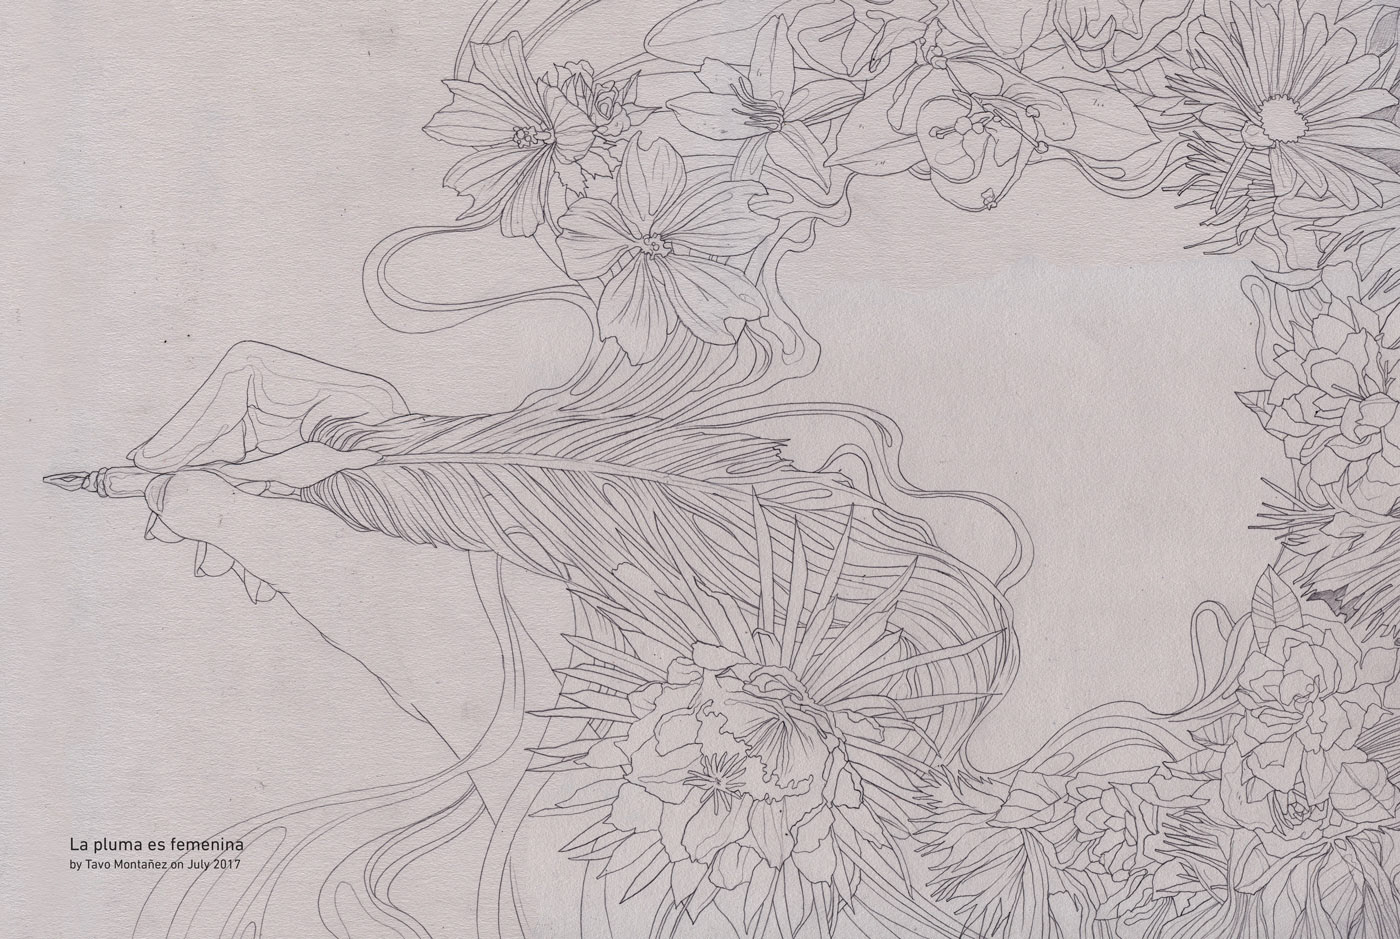 editorial magazine Digital Art  digital illustration ILLUSTRATION  Drawing  jk rowling Isabel Allende art woman